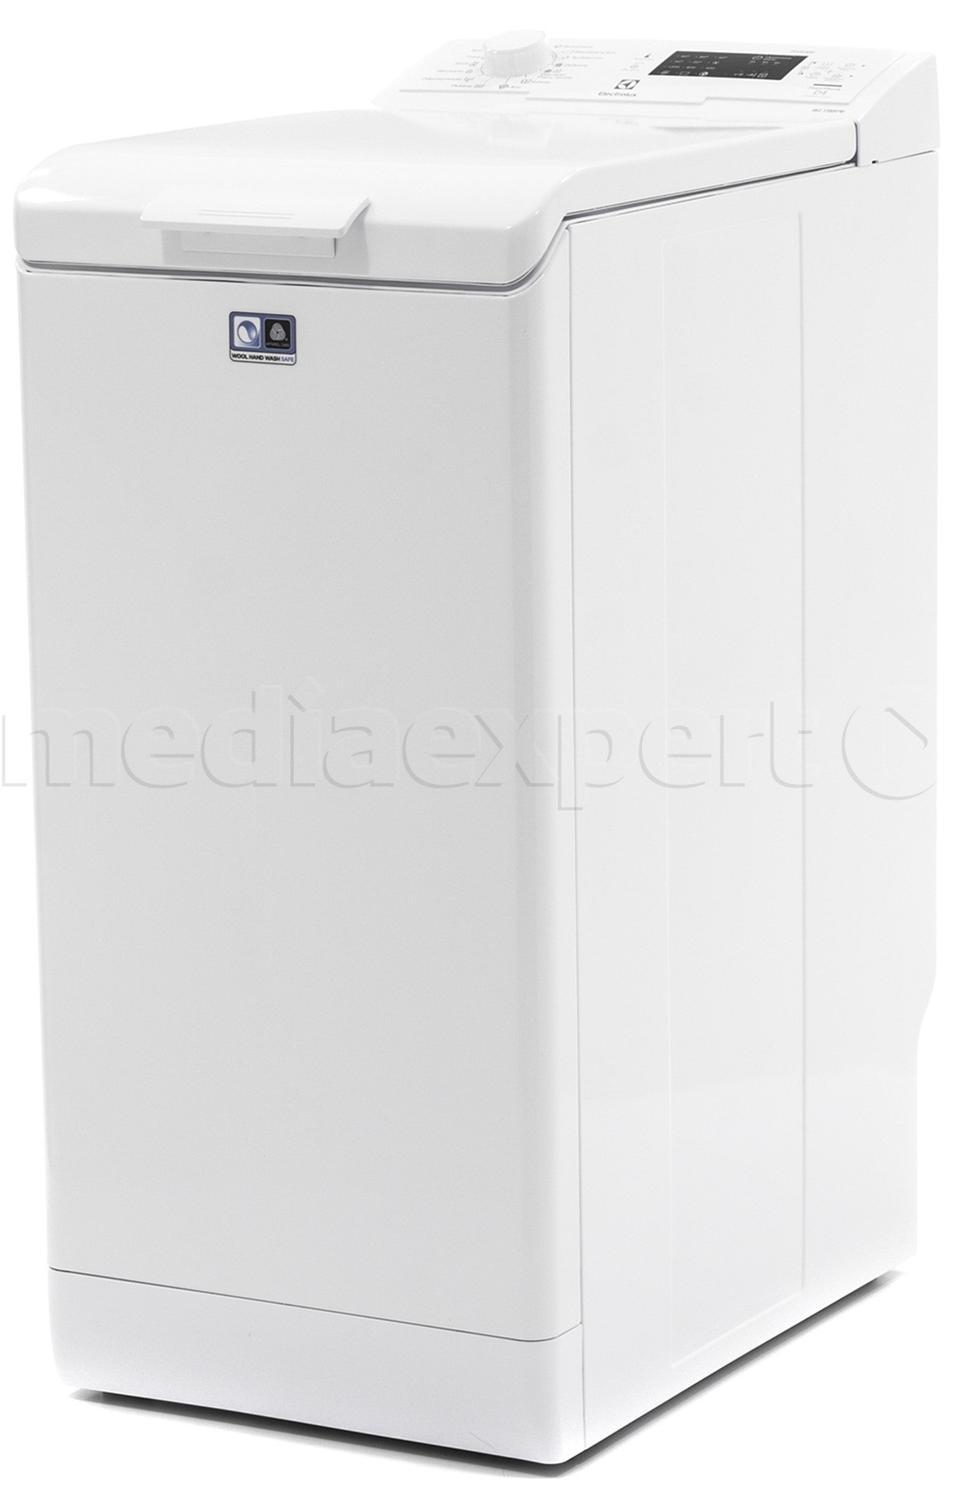 Electrolux EWT11262ILW